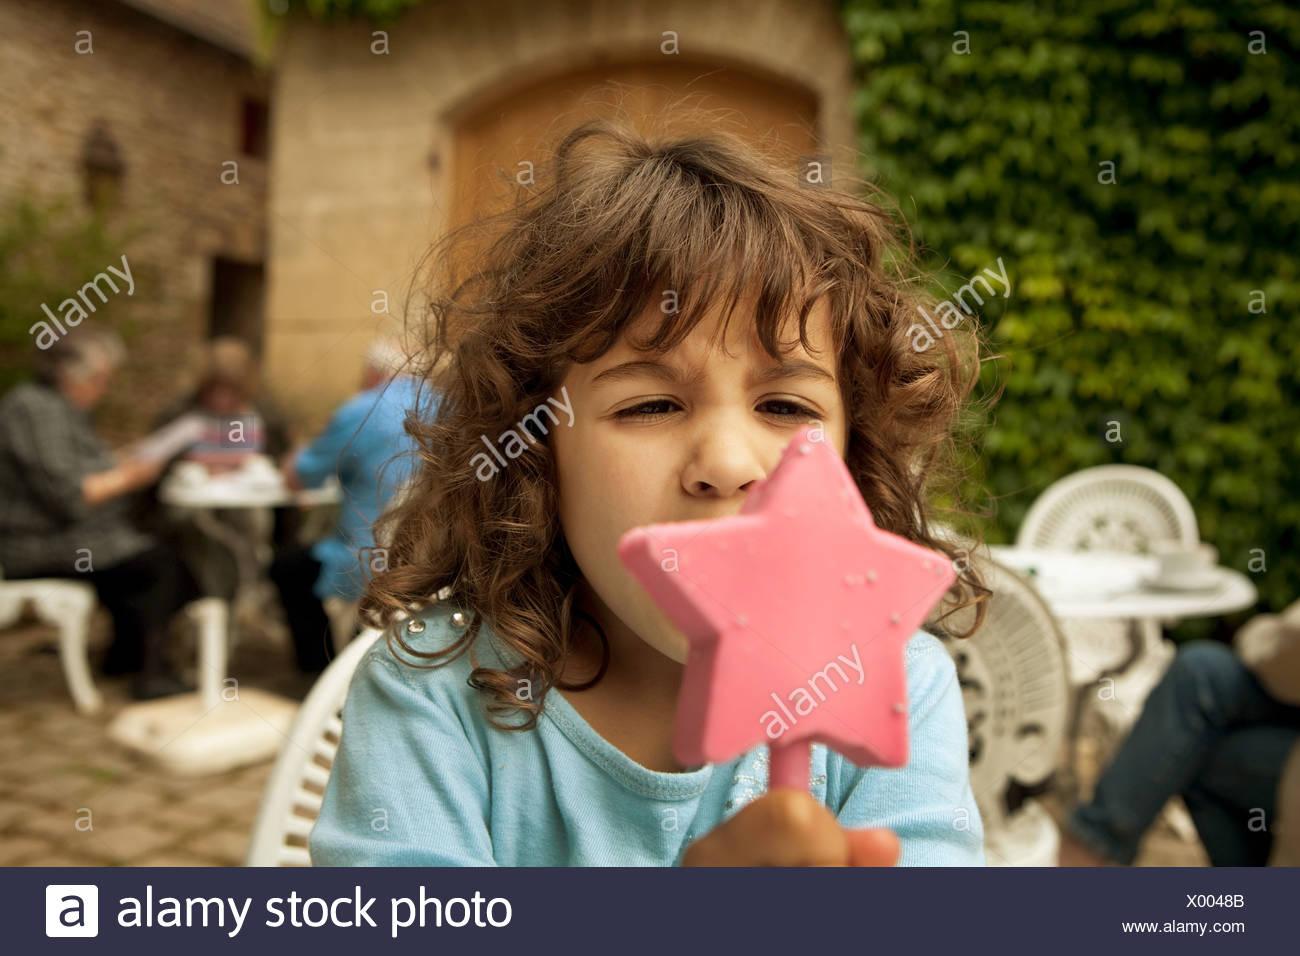 Girl eating star shaped ice cream - Stock Image